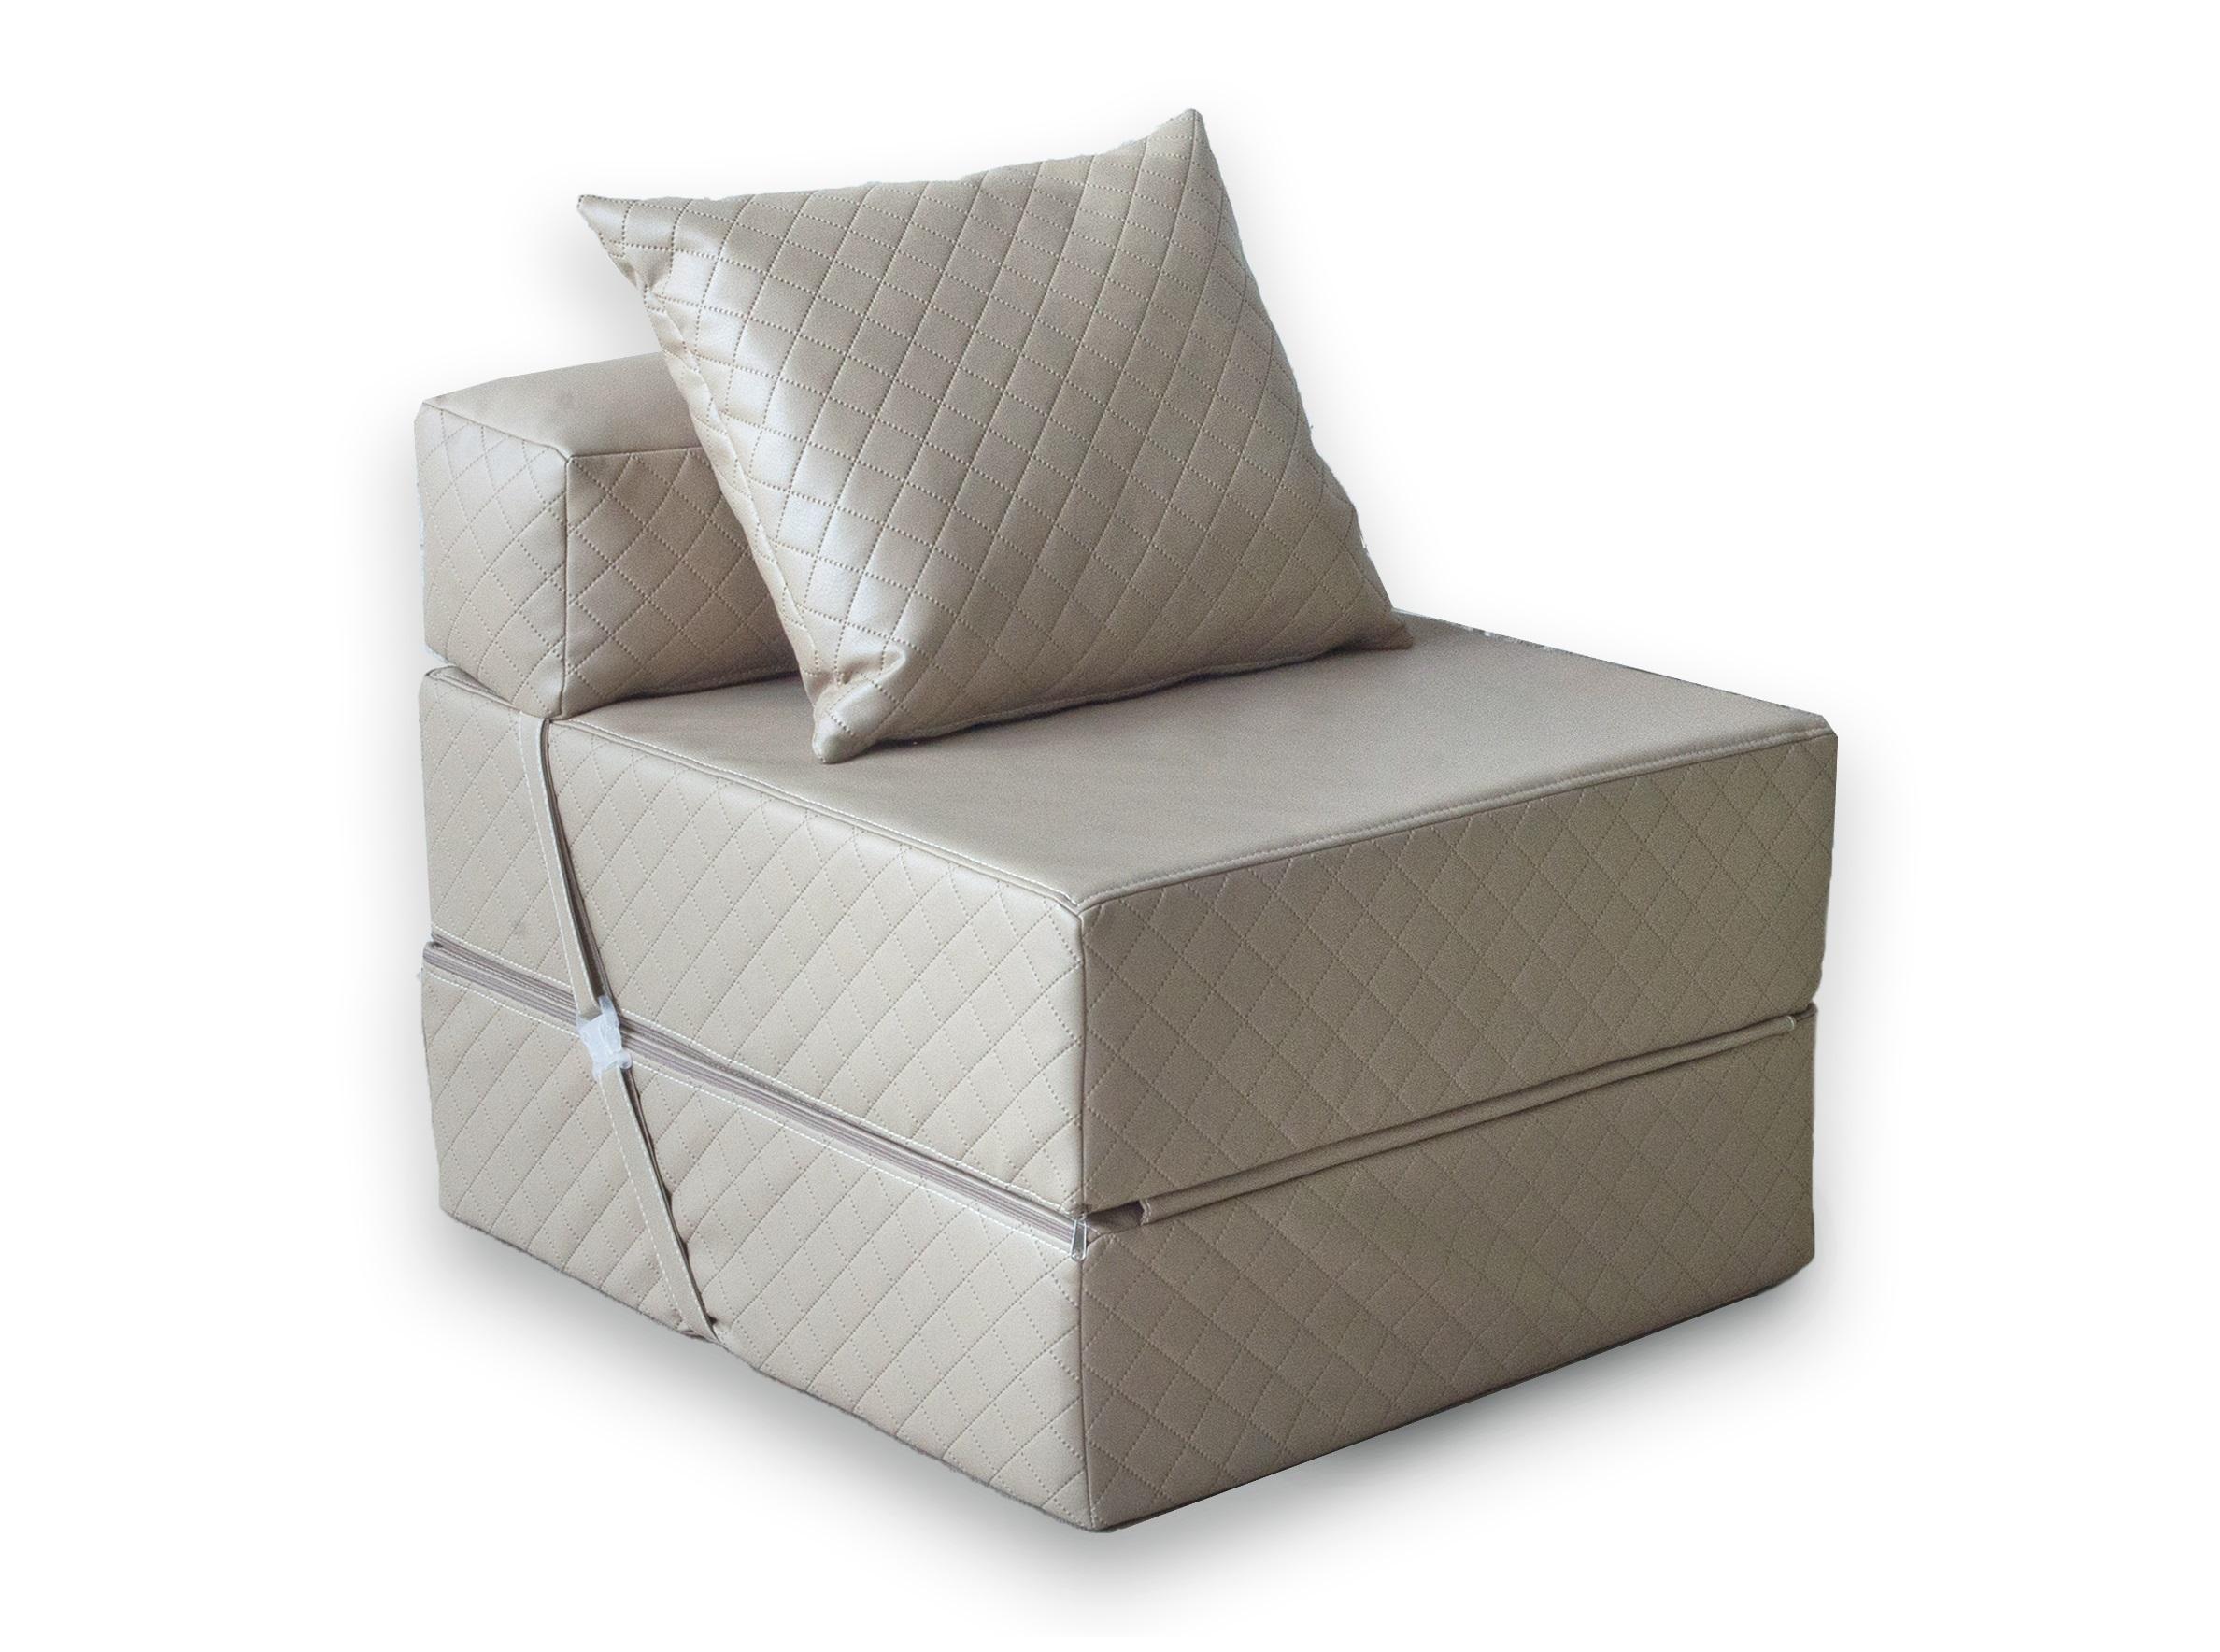 Кресла-кровати от thefurnish